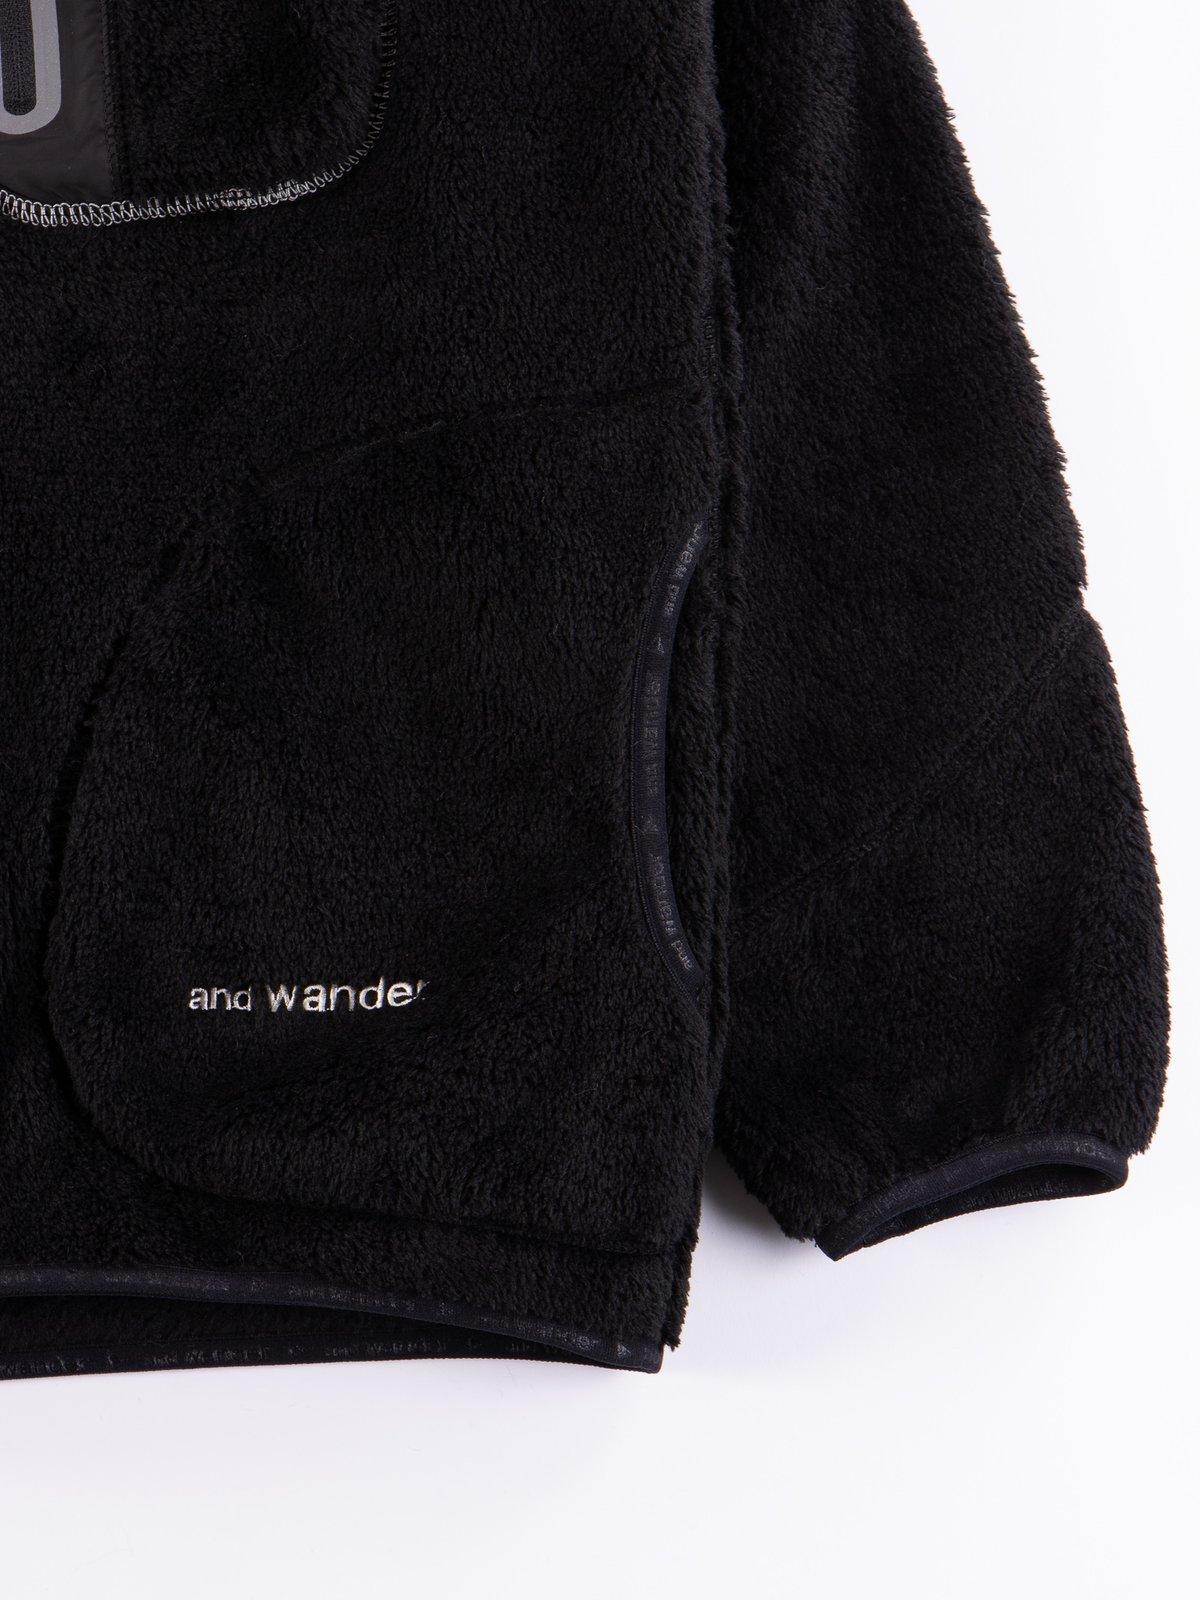 Black High Loft Fleece Pullover - Image 5